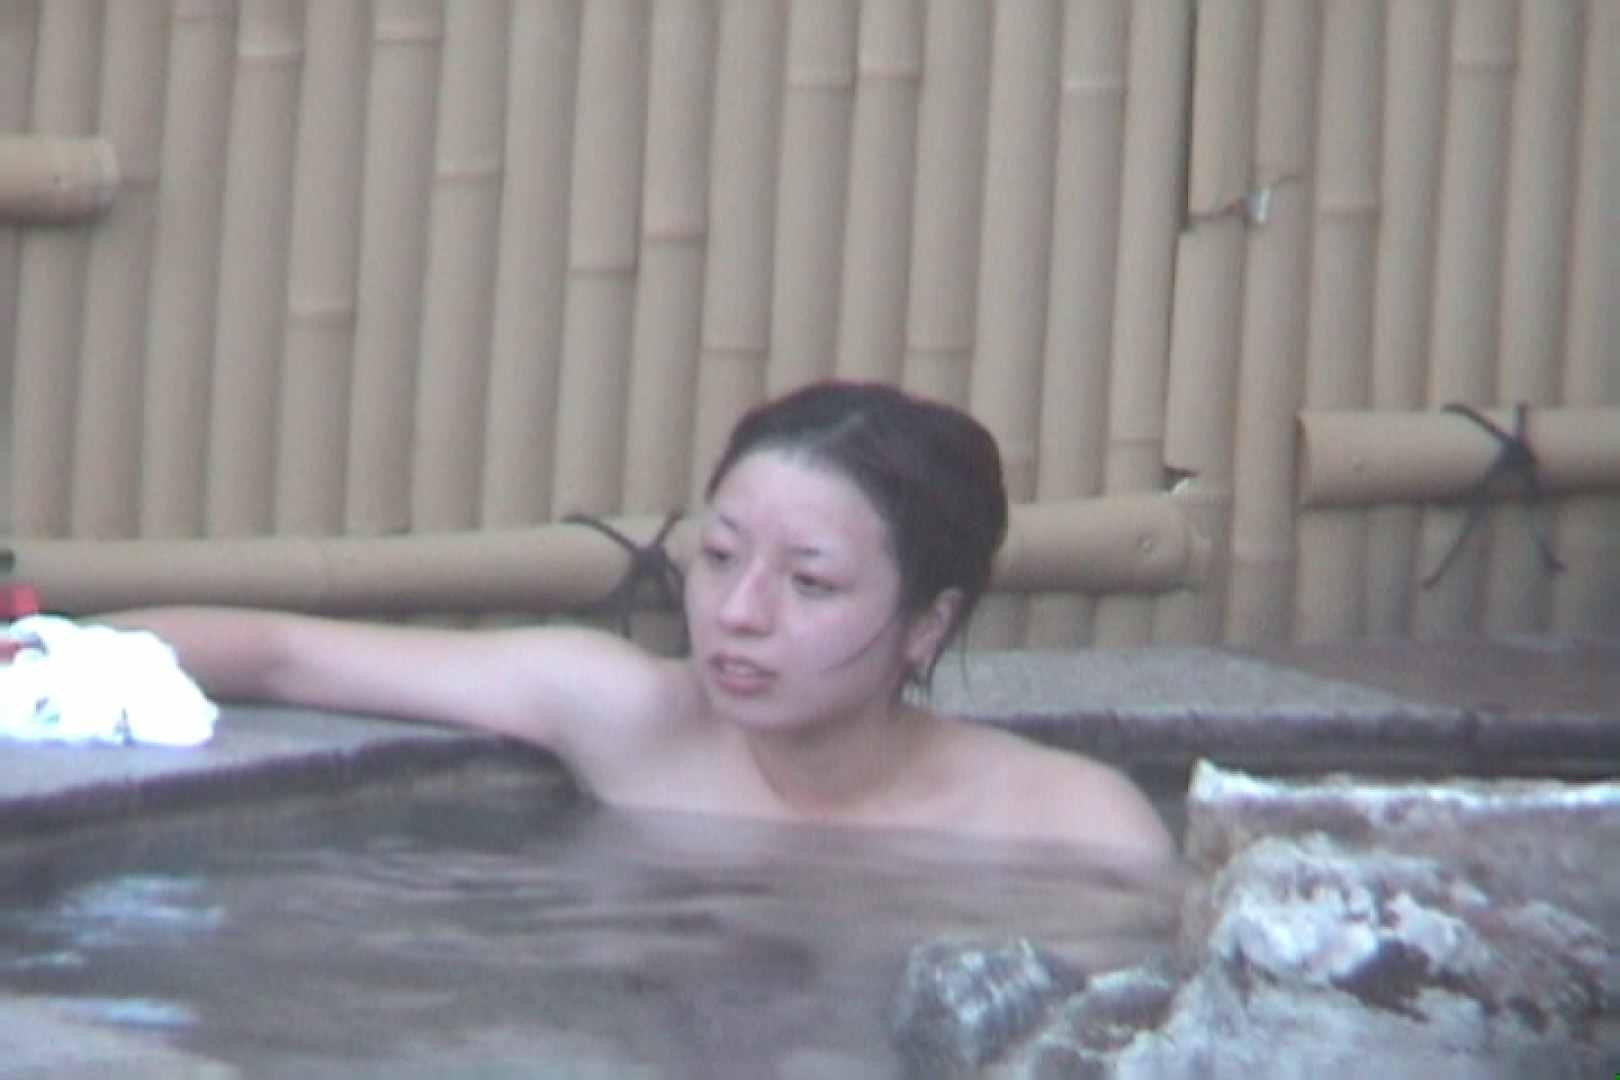 Aquaな露天風呂Vol.608 HなOL | 盗撮  89pic 45